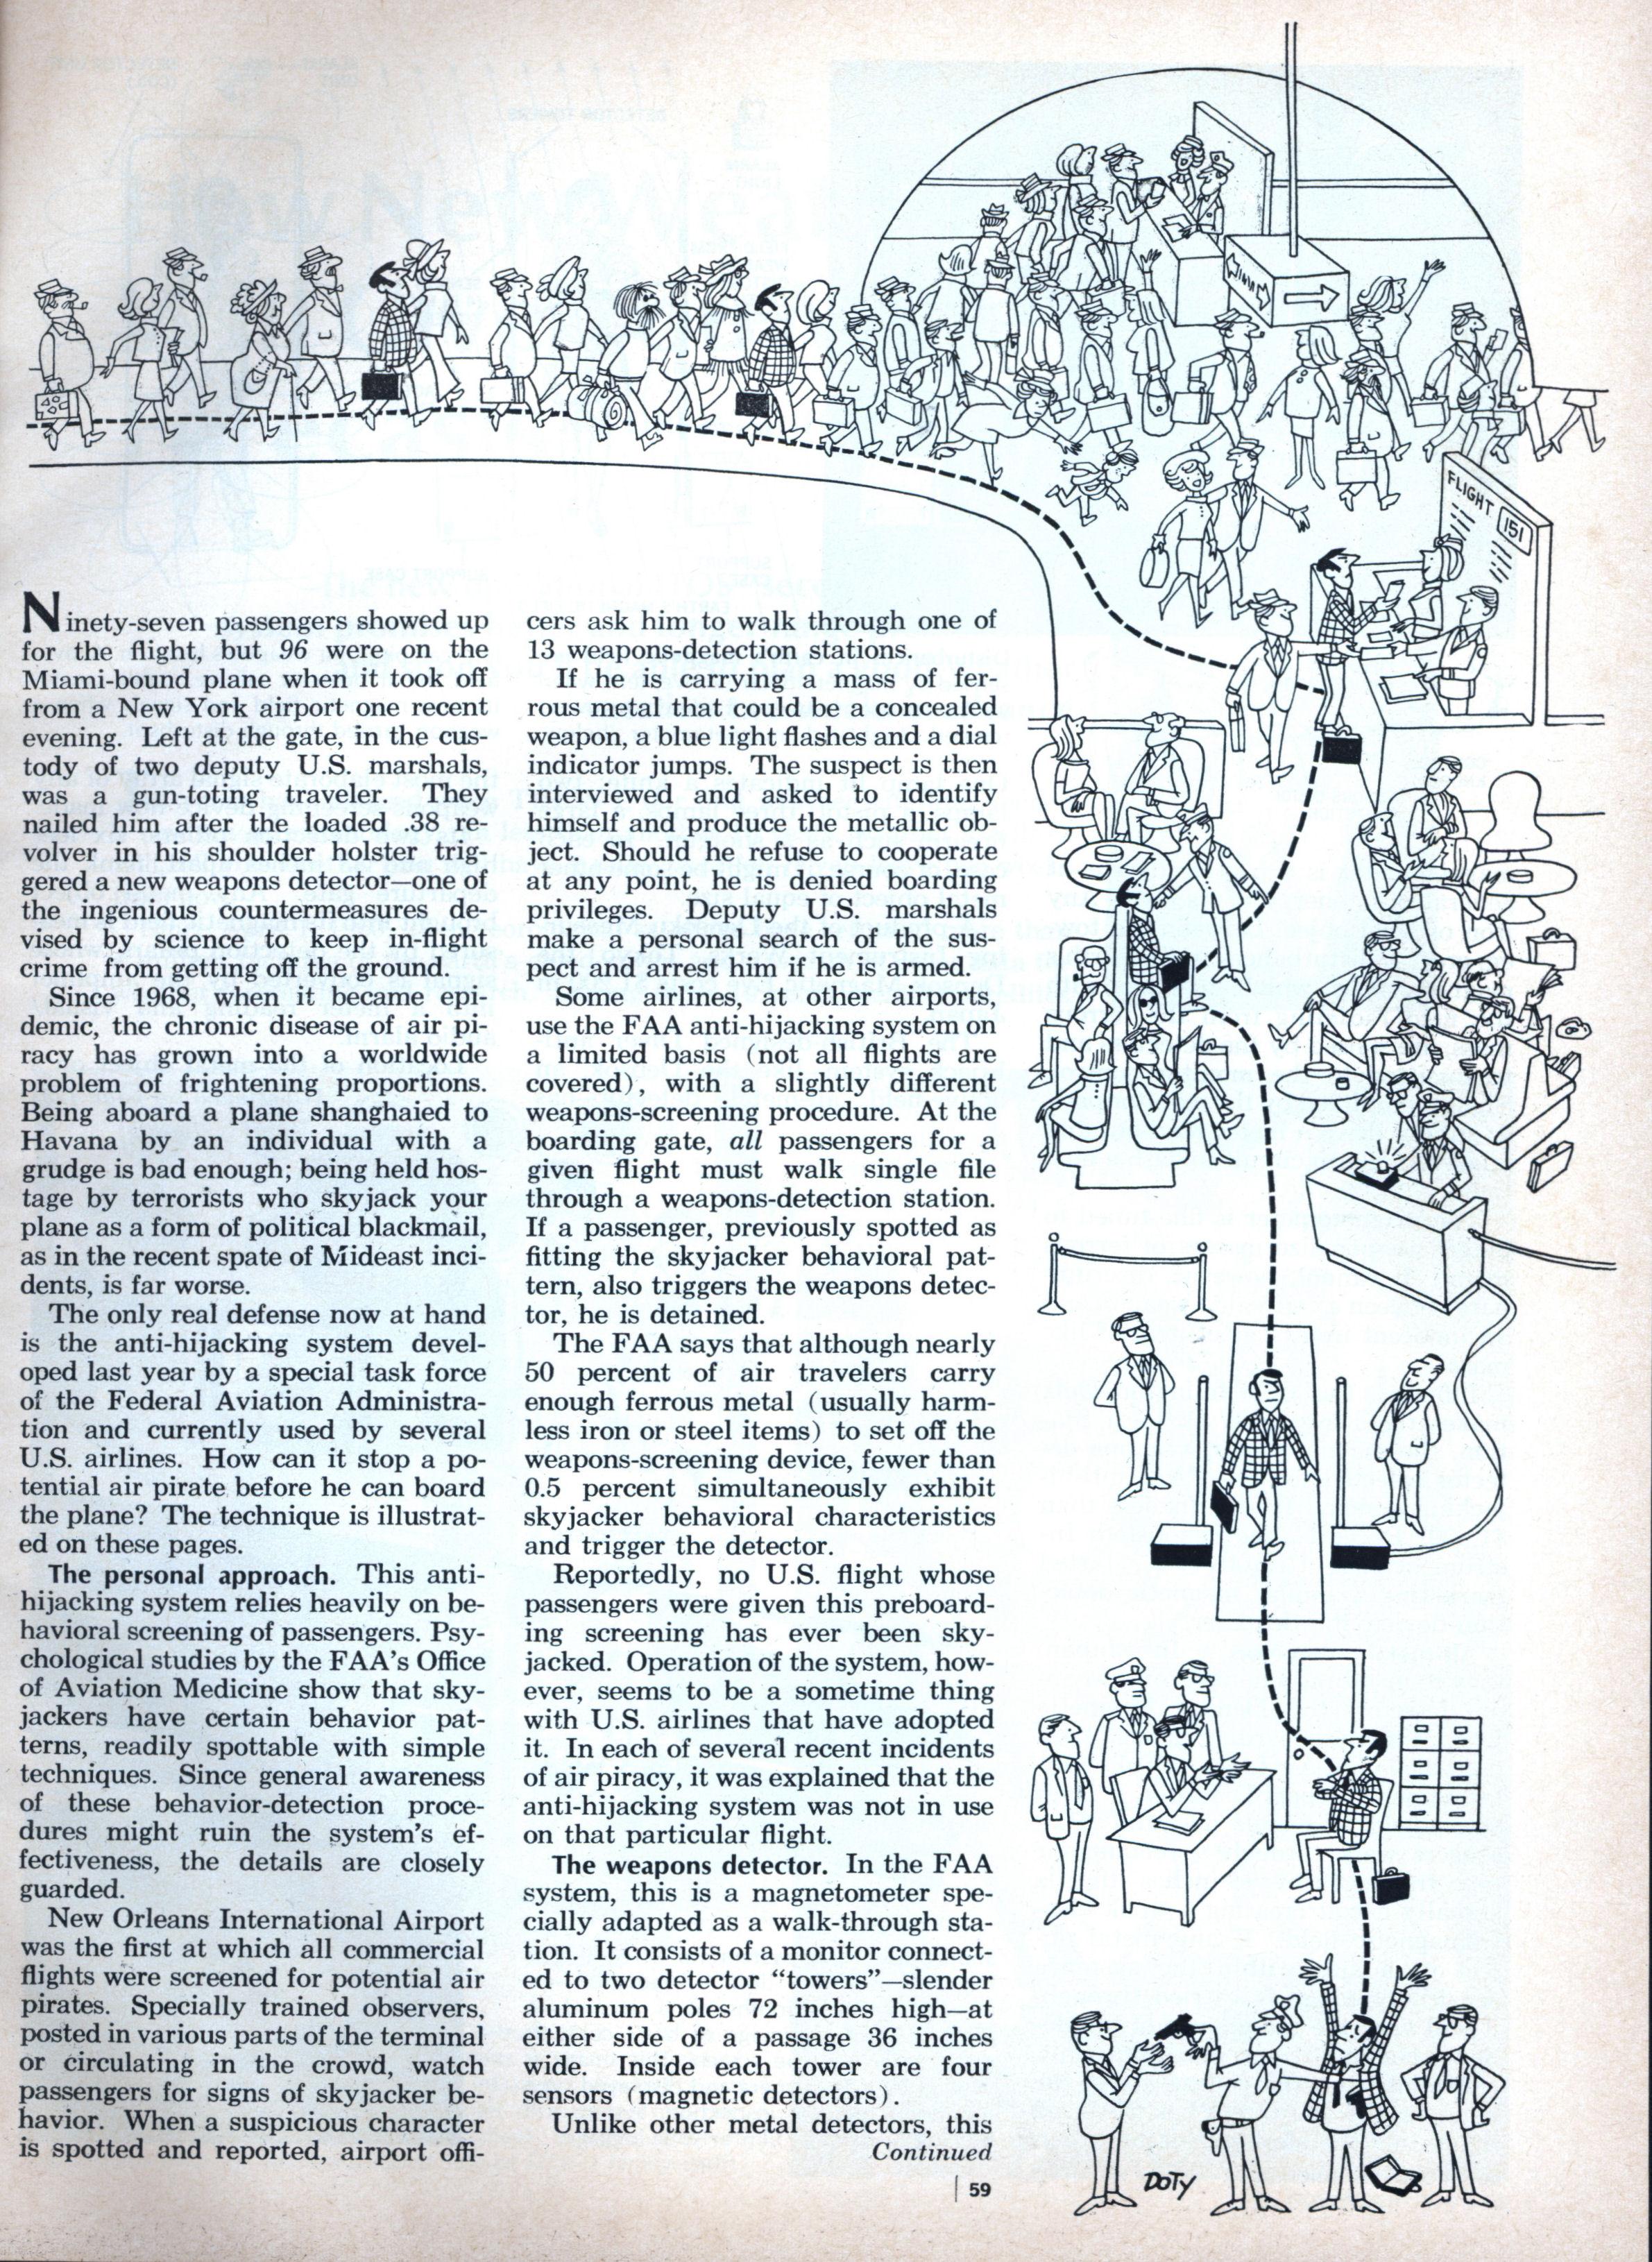 http://blog.modernmechanix.com/mags/PopularScience/11-1970/skyjackers/skyjackers_1.jpg